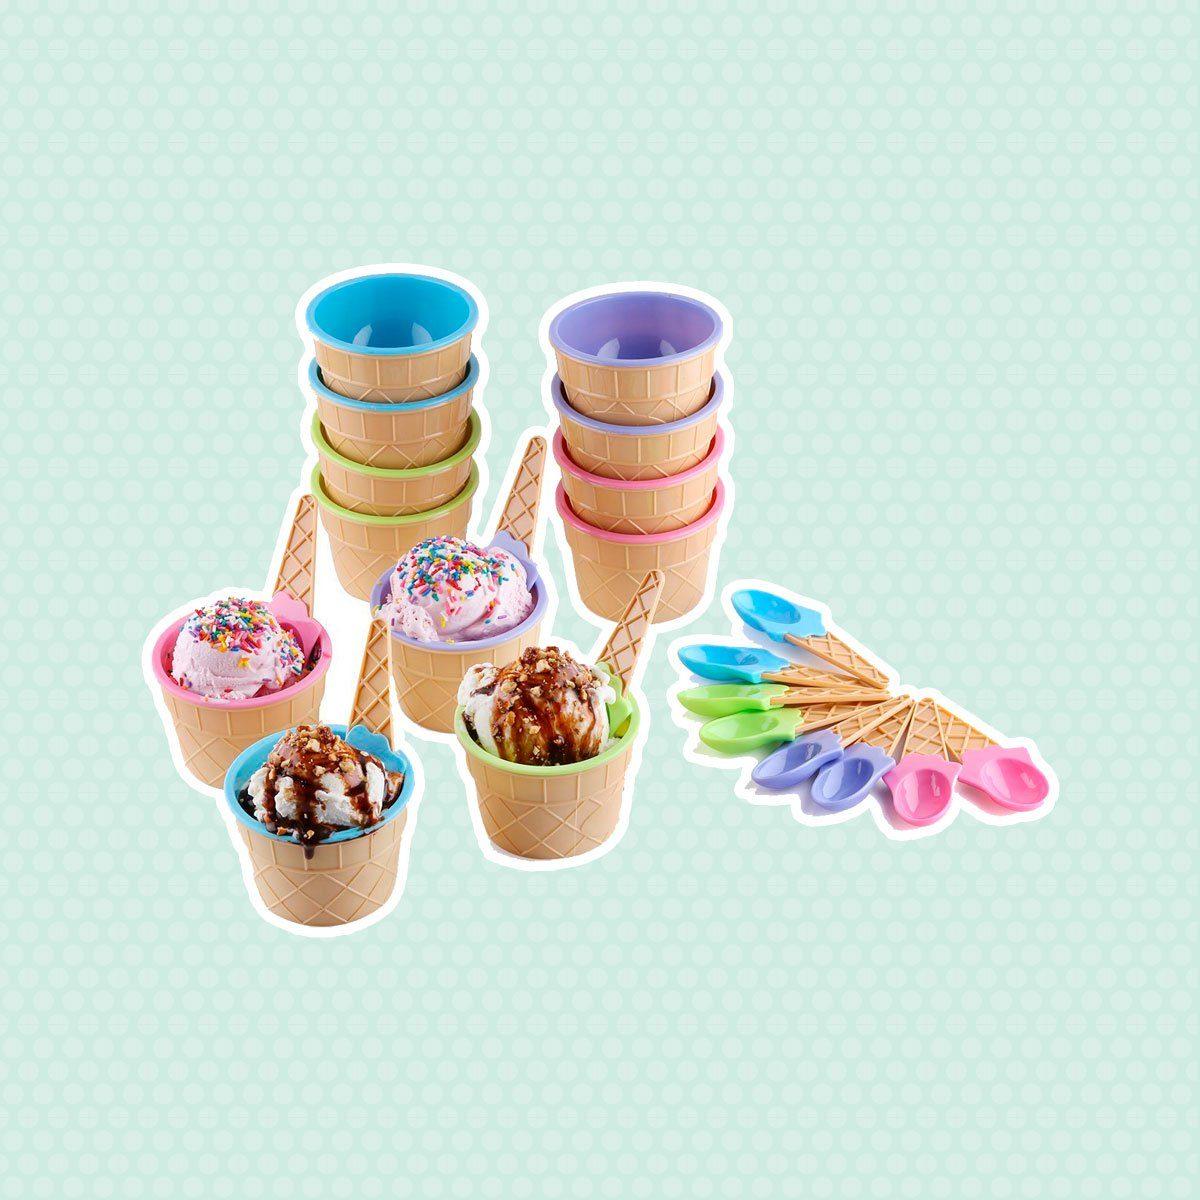 Greenco Vibrant Colors Dessert Bowls and Spoons